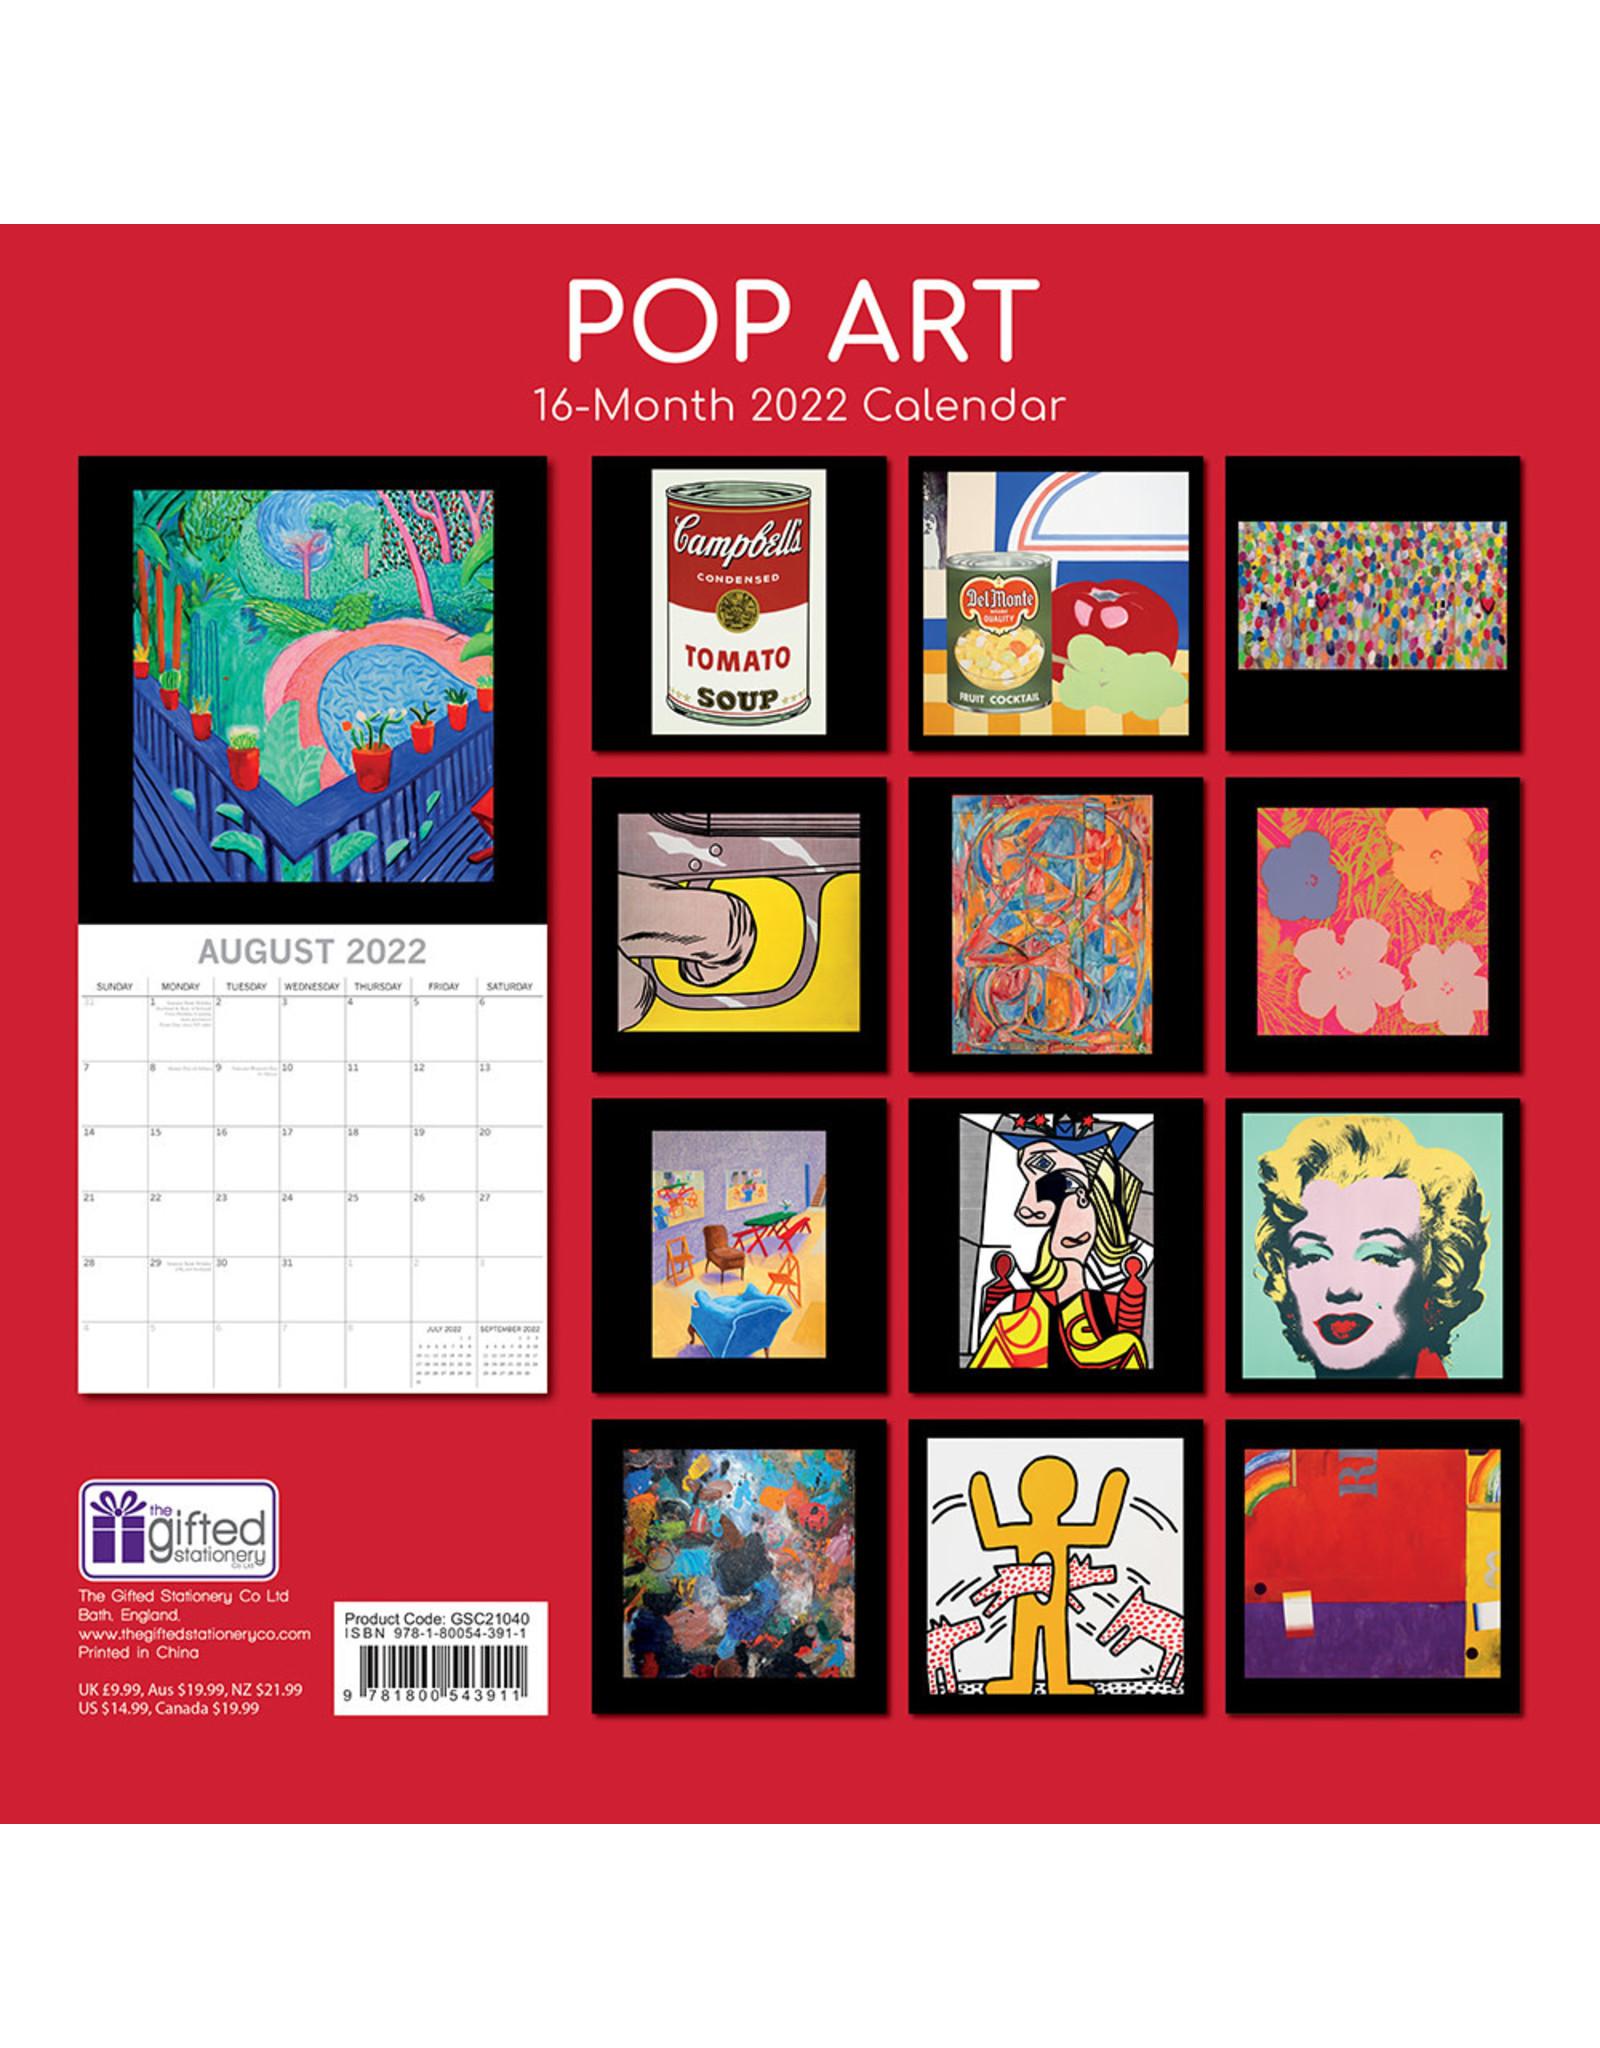 calendar 2022 with pop art pictures